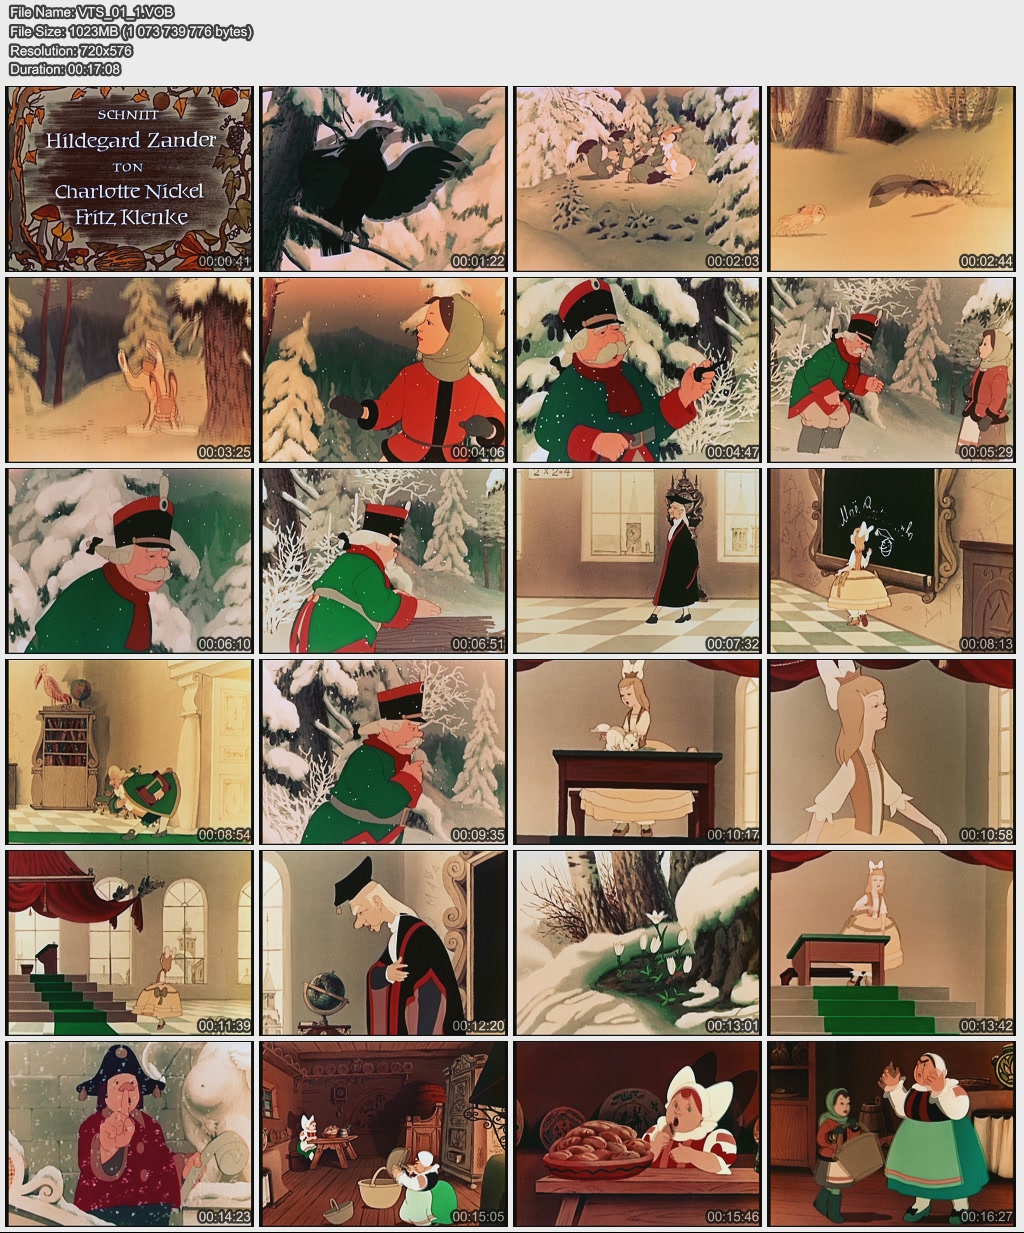 Die zwölf Monate / 12 месяцев (1956) DVD-5 [De]